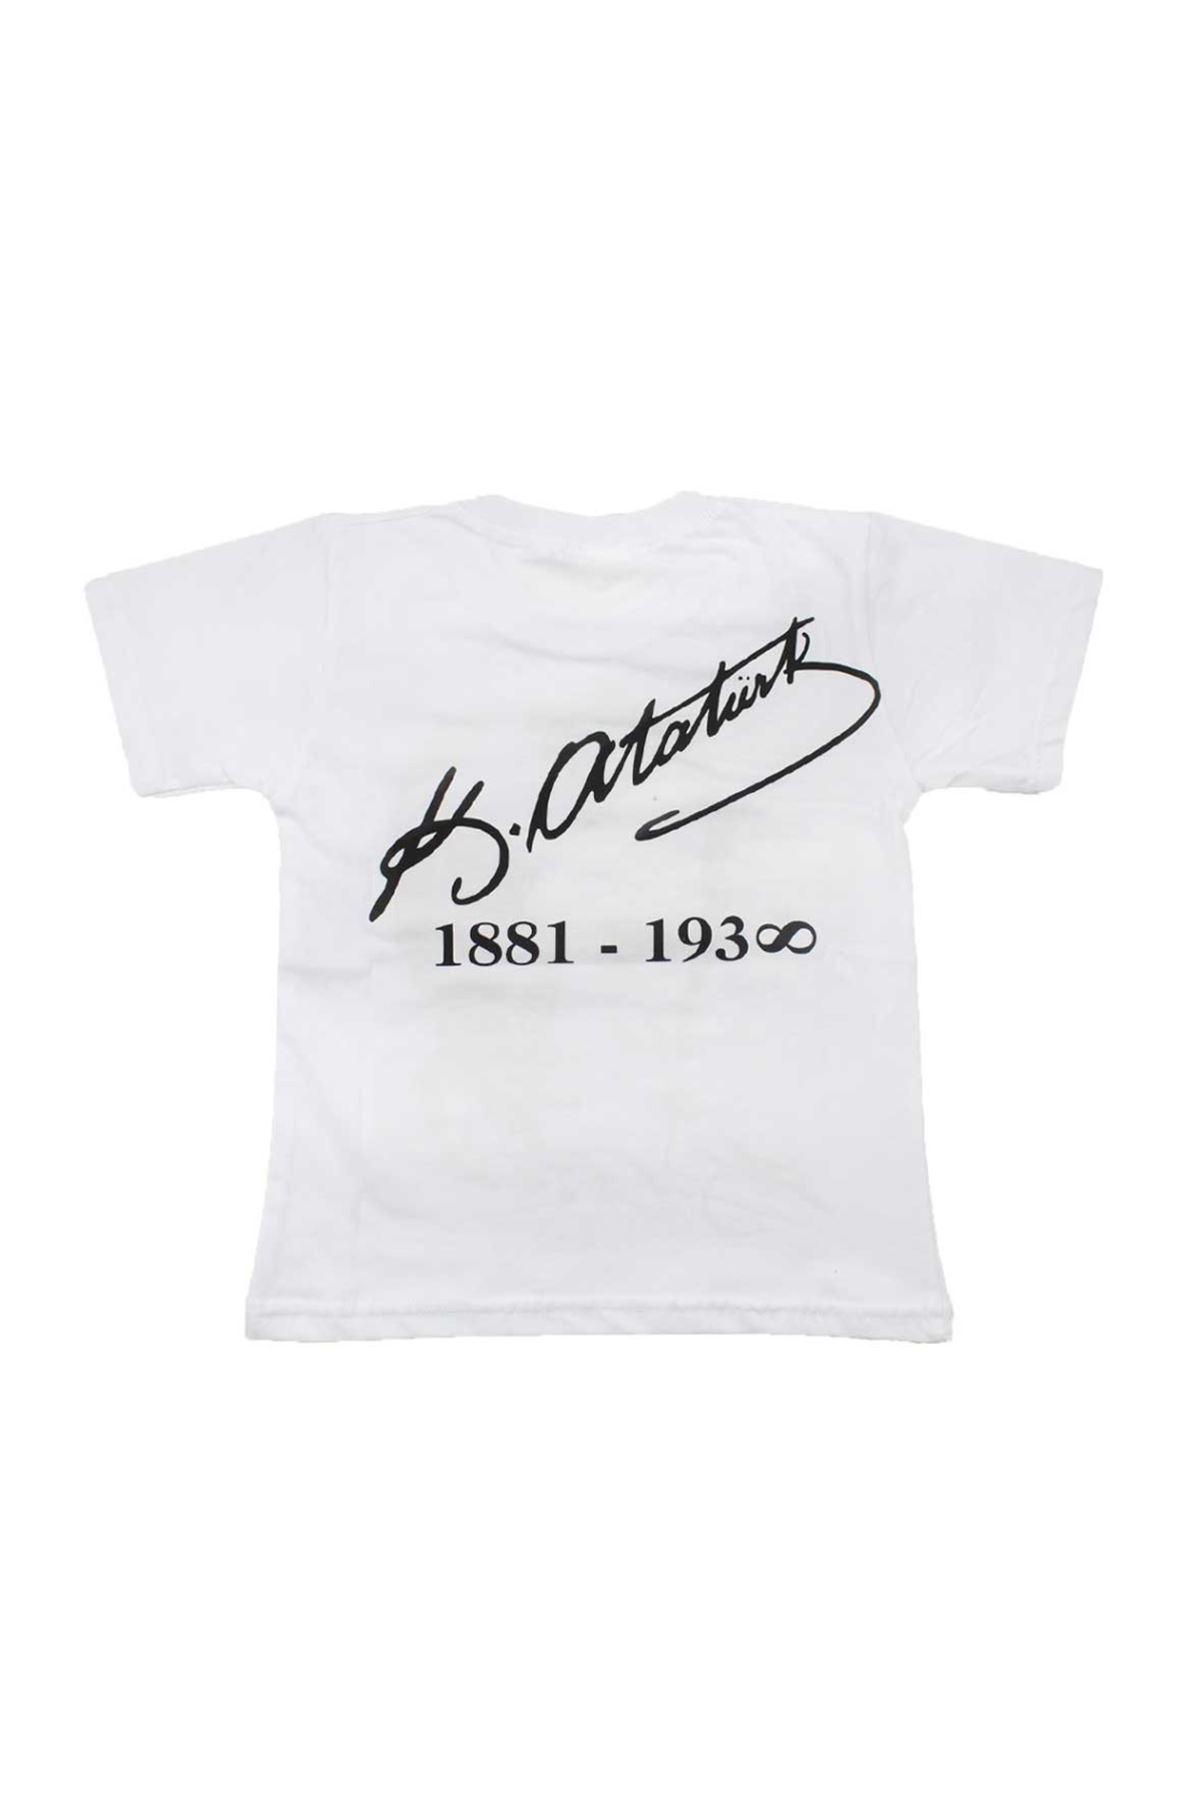 Beyaz Çift Taraf Atatürk Baskılı S-M-L-XL  Pamuklu Tişört